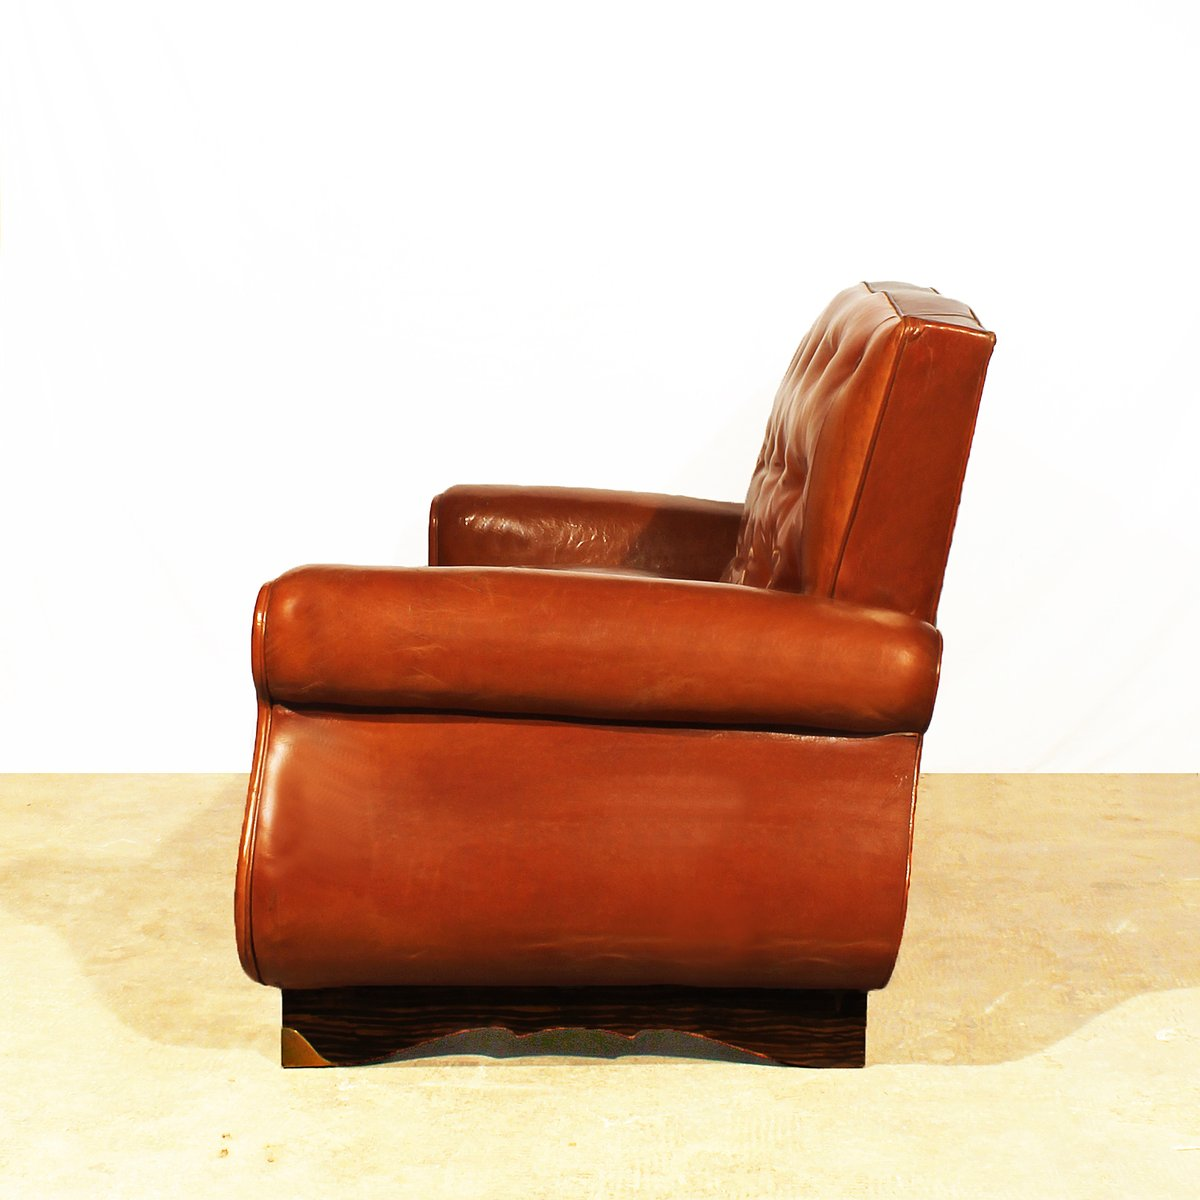 Sofa im chesterfield stil 1940er bei pamono kaufen for Sofa japanischer stil